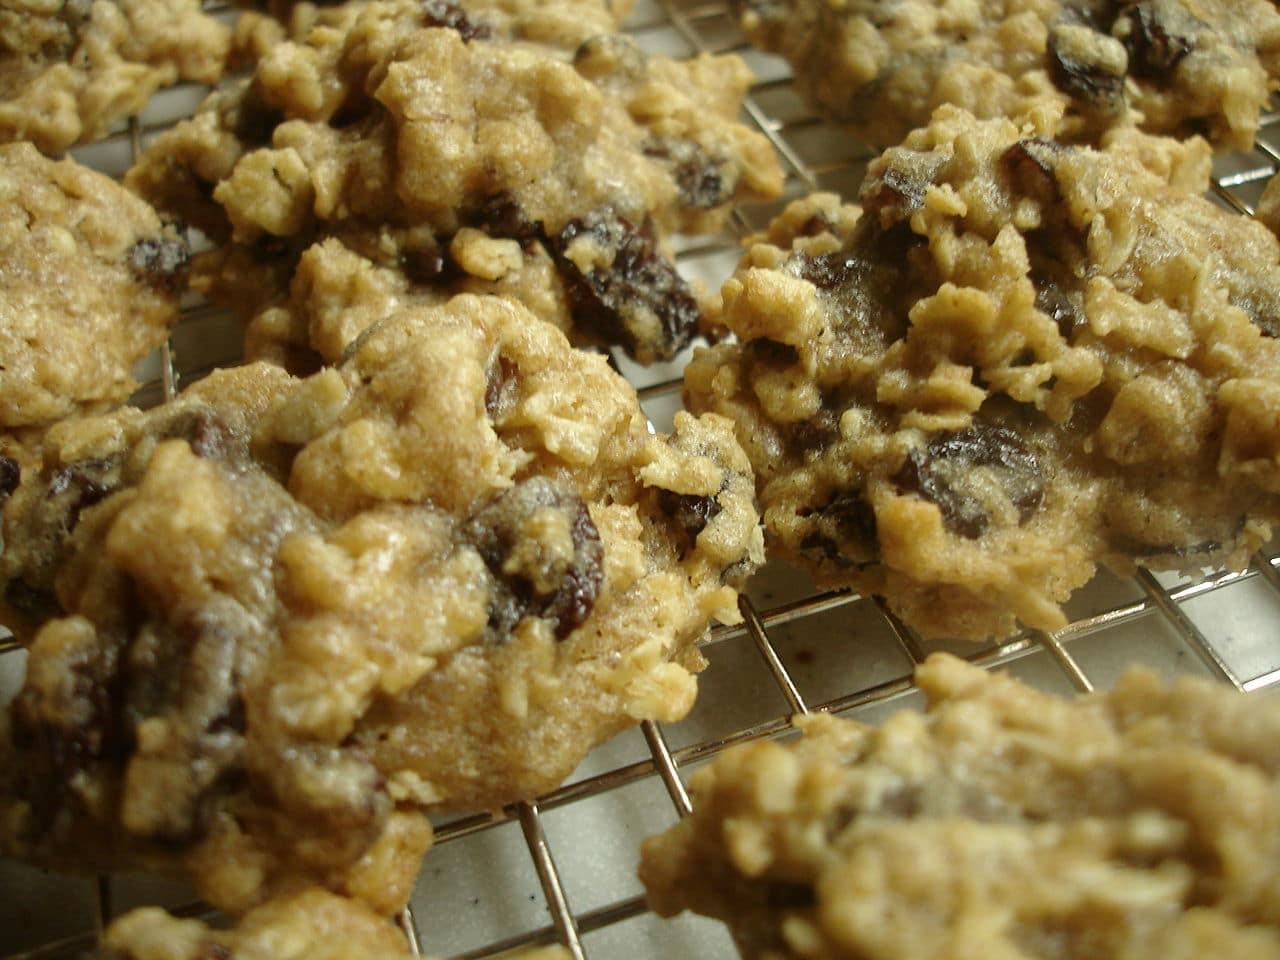 High Fiber Oatmeal Cookies  Food Fiber Types of Fiber Properties and Benefits